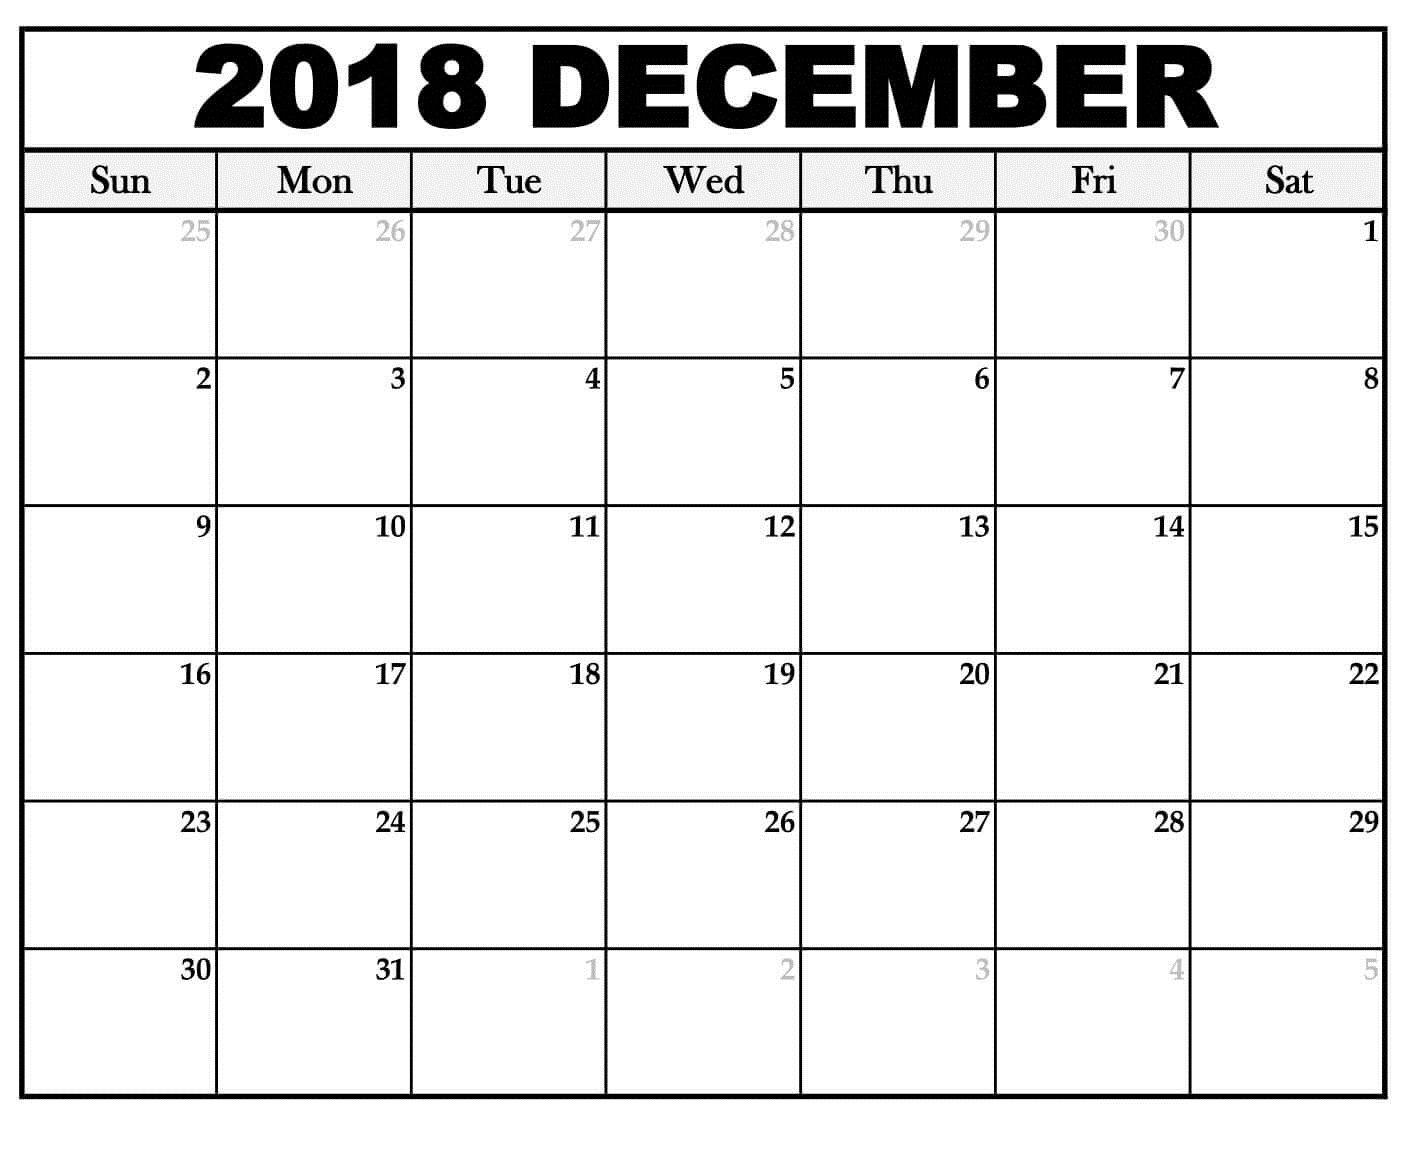 Calendar December 2018 Editable Template | Printable Calendar regarding December Monthly Calendar Template